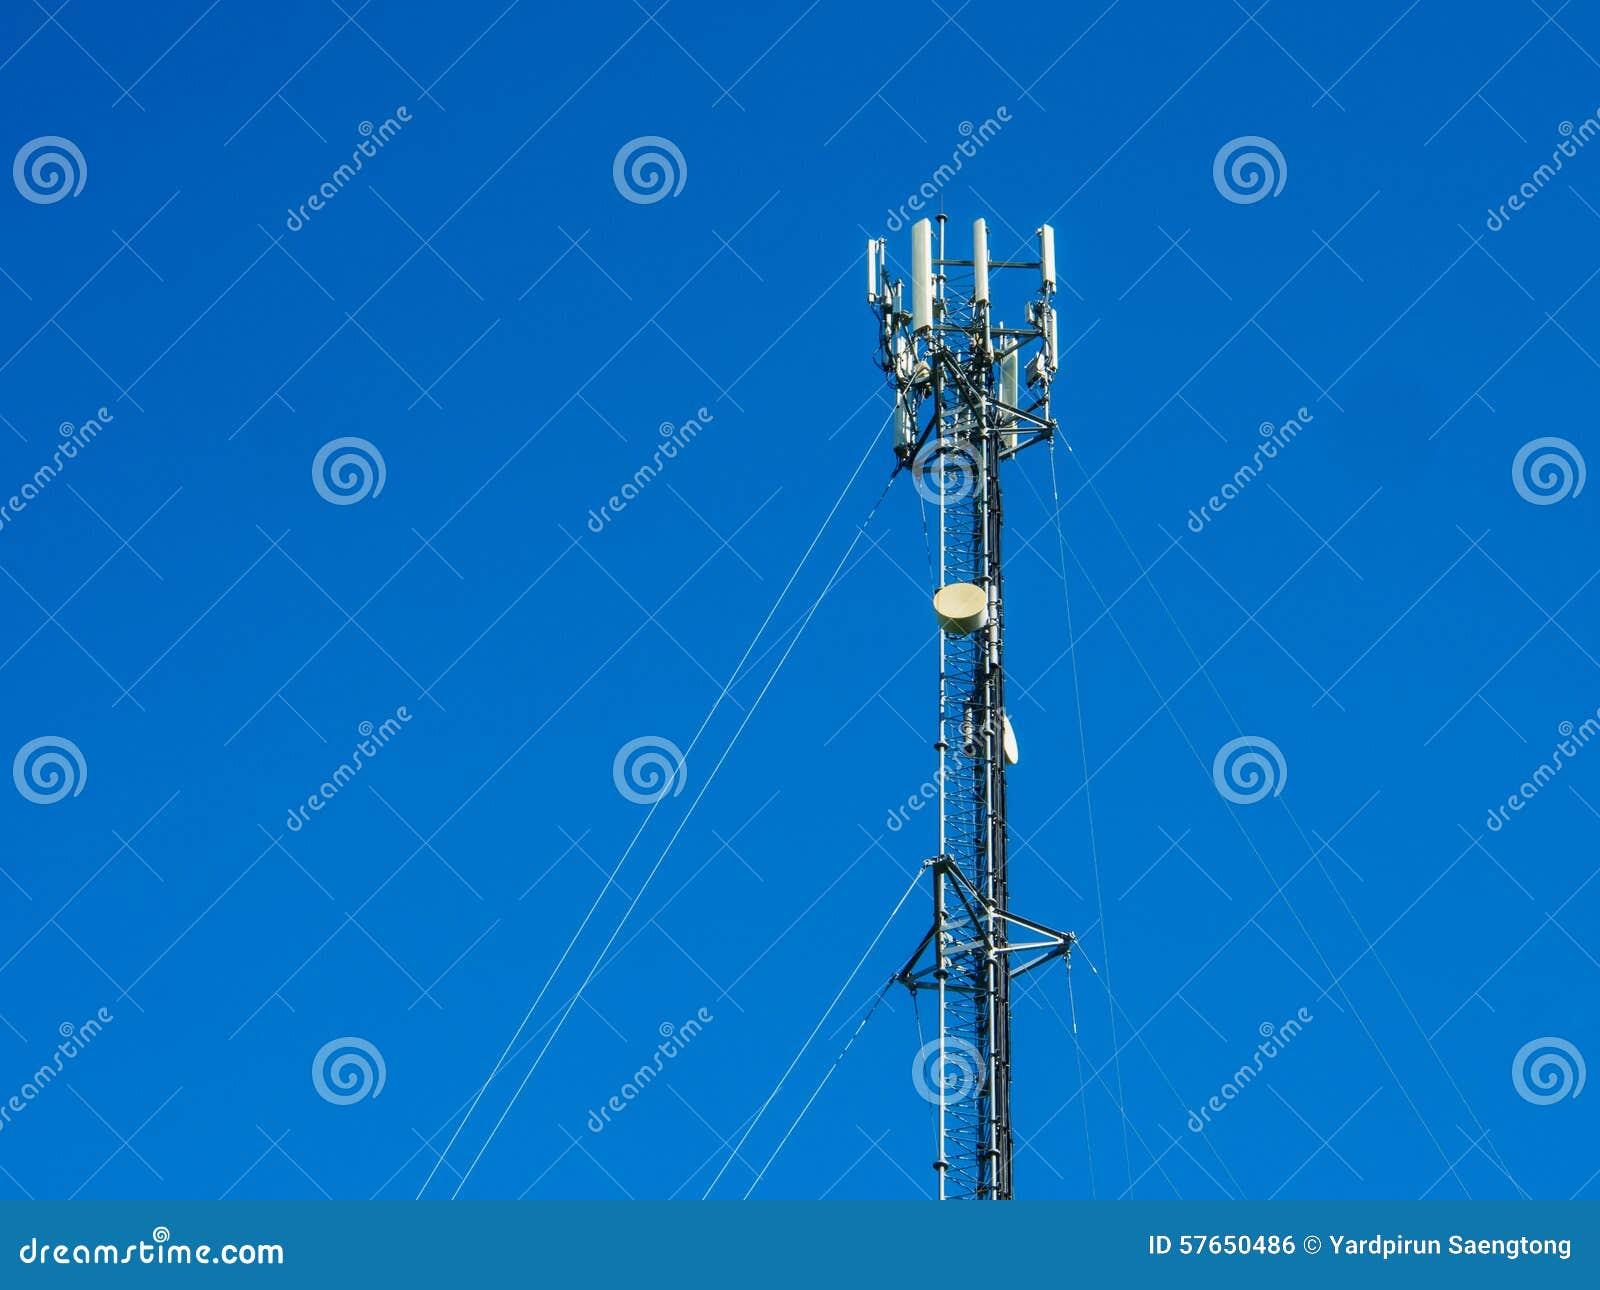 Antena dla use komunikuje